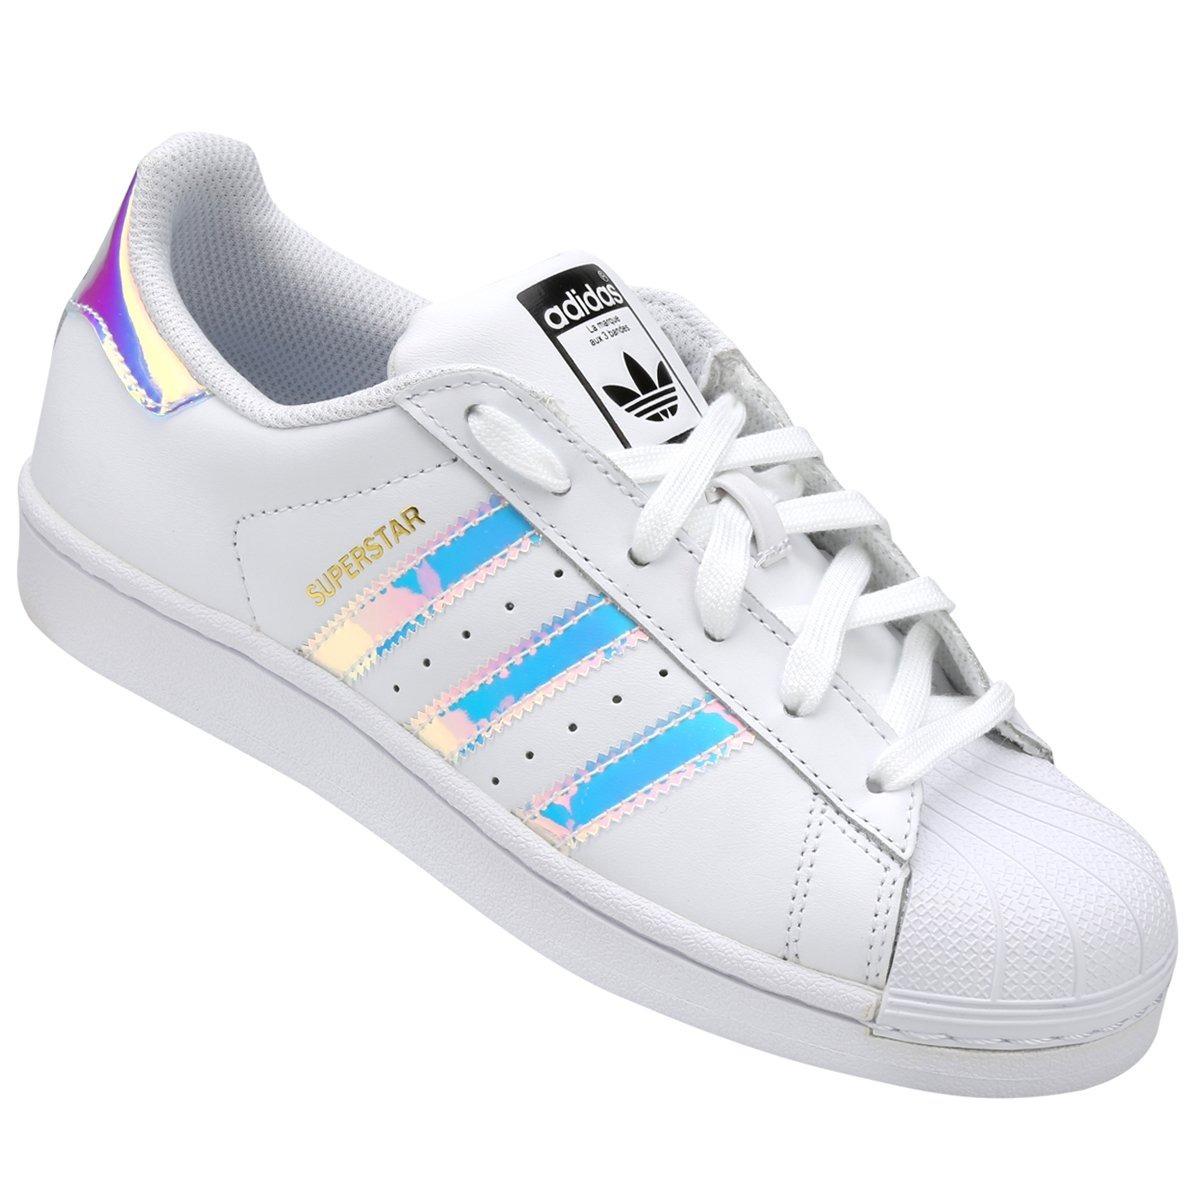 ef2c9377dd8 ... discount tenis adidas superstar tornasol iridescent oferta navidad  cargando zoom. d8892 28ecb